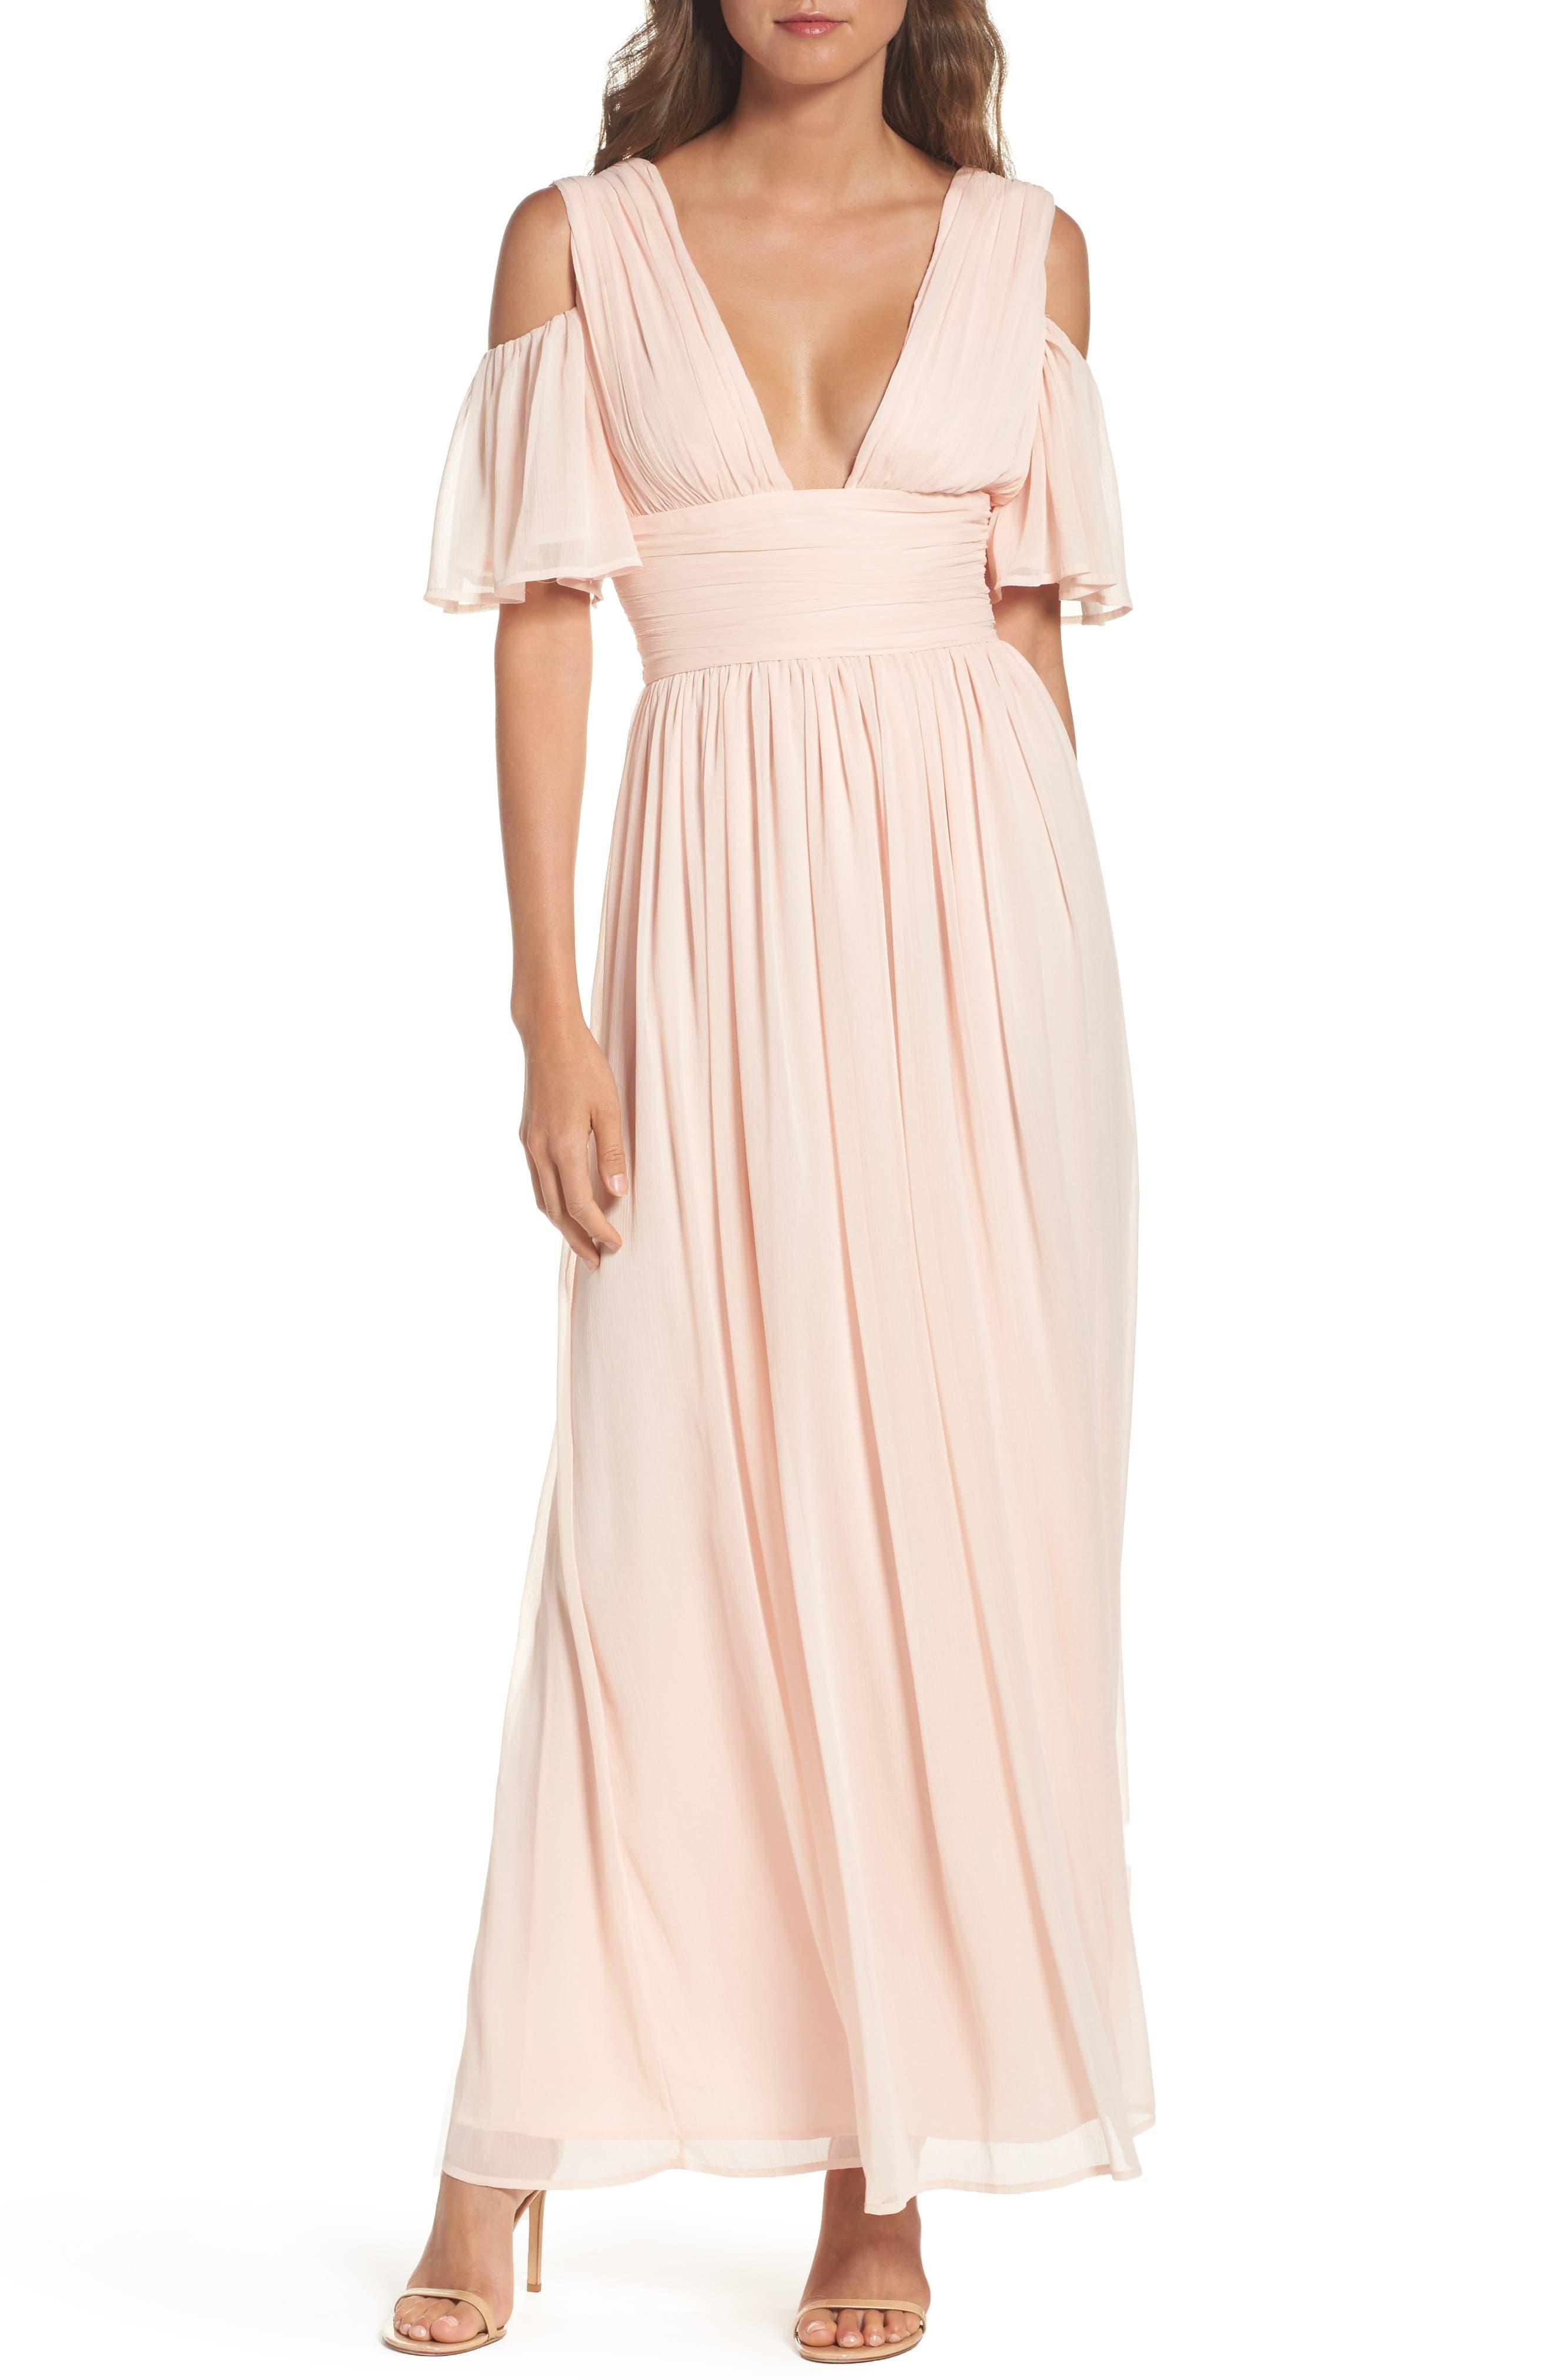 Constance Cold Shoulder Maxi Dress,                         Main,                         color, 680